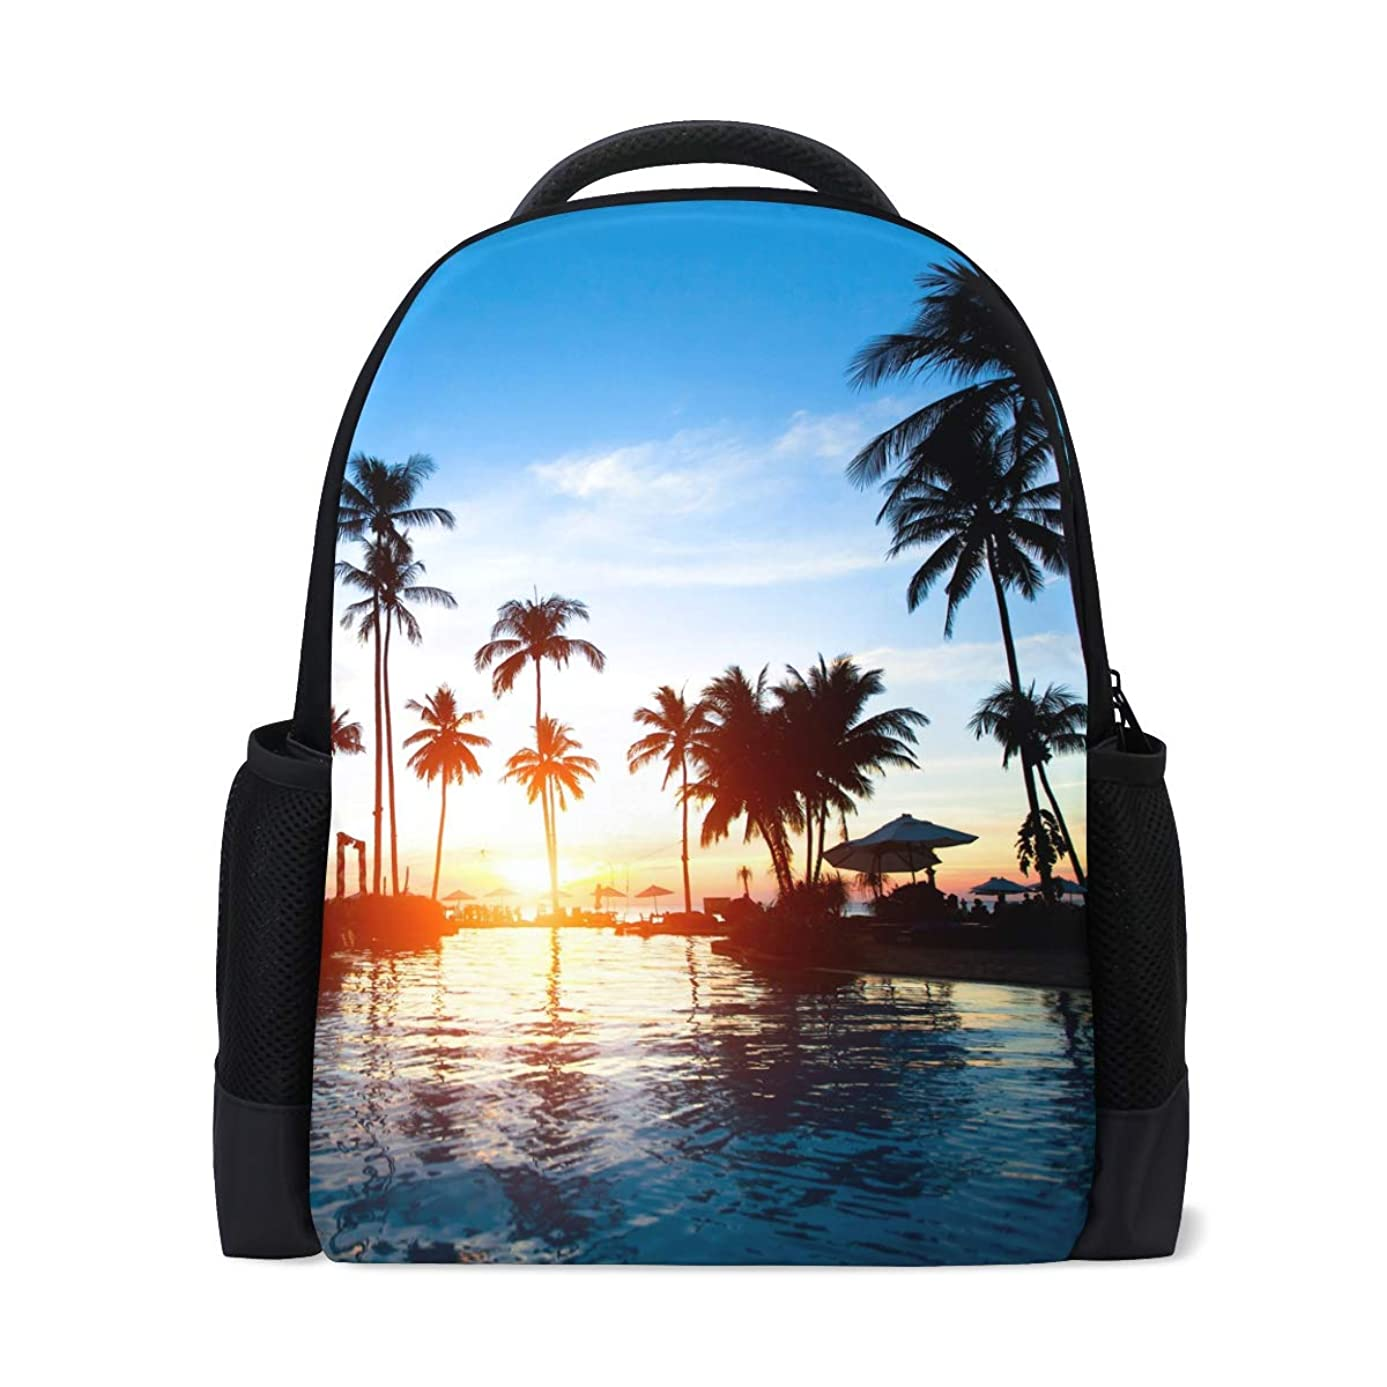 Backpack Bookbag Daypack Tropical Sunrise Landscape Waterproof for Middle Travel Girls Boys